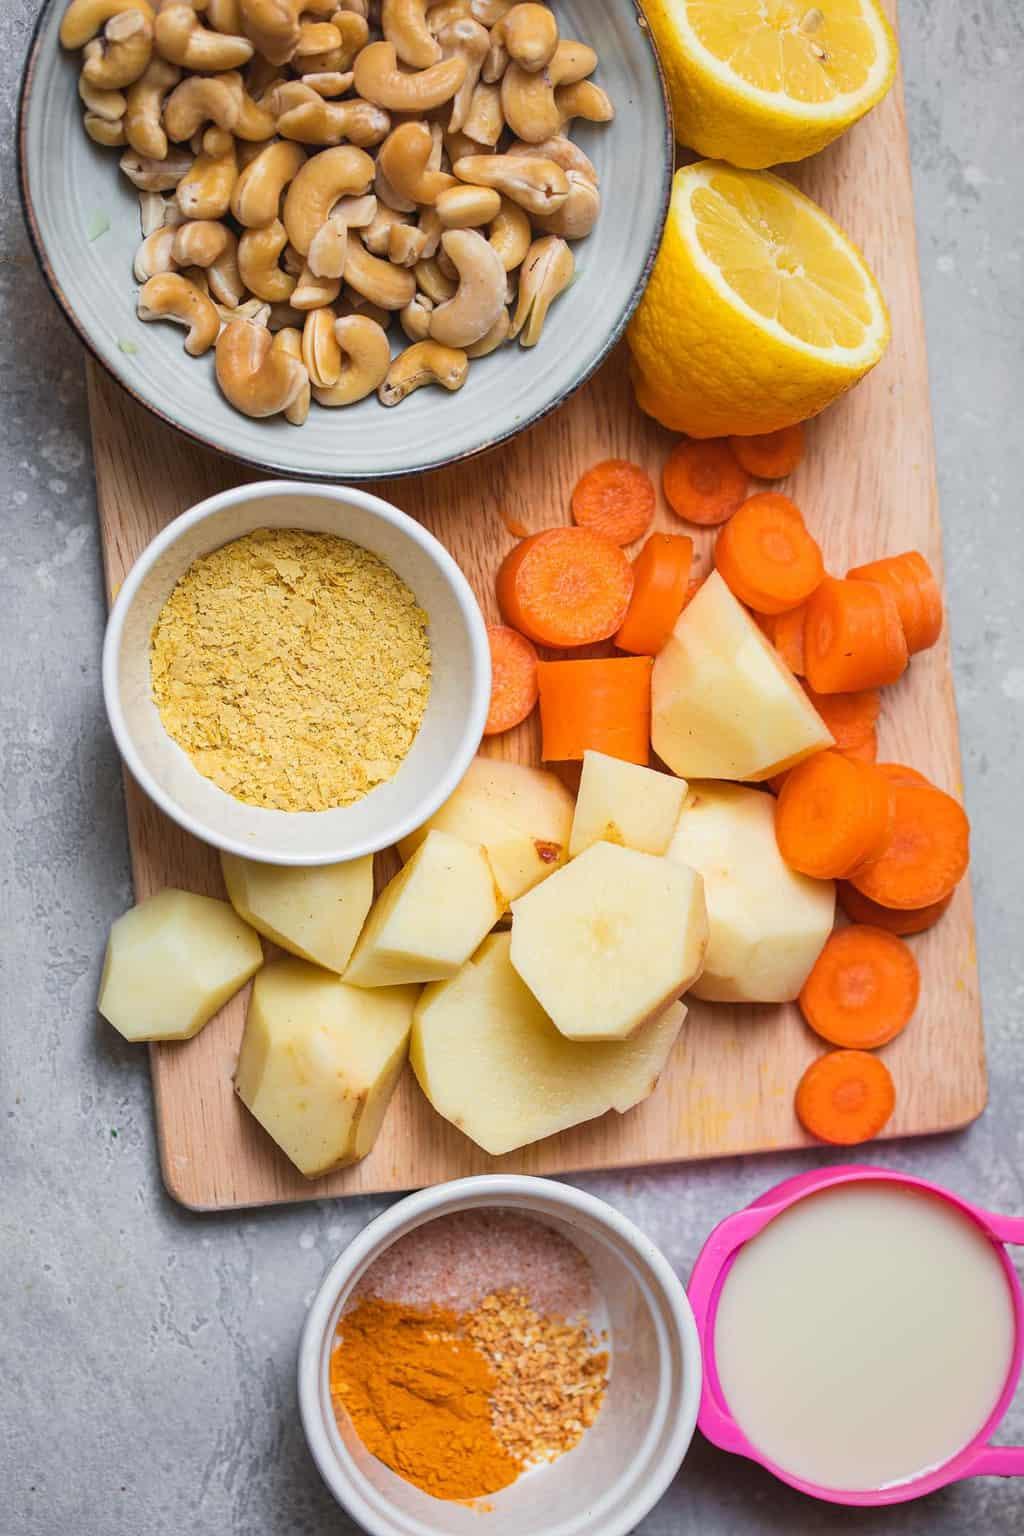 Vegan cheese sauce ingredients